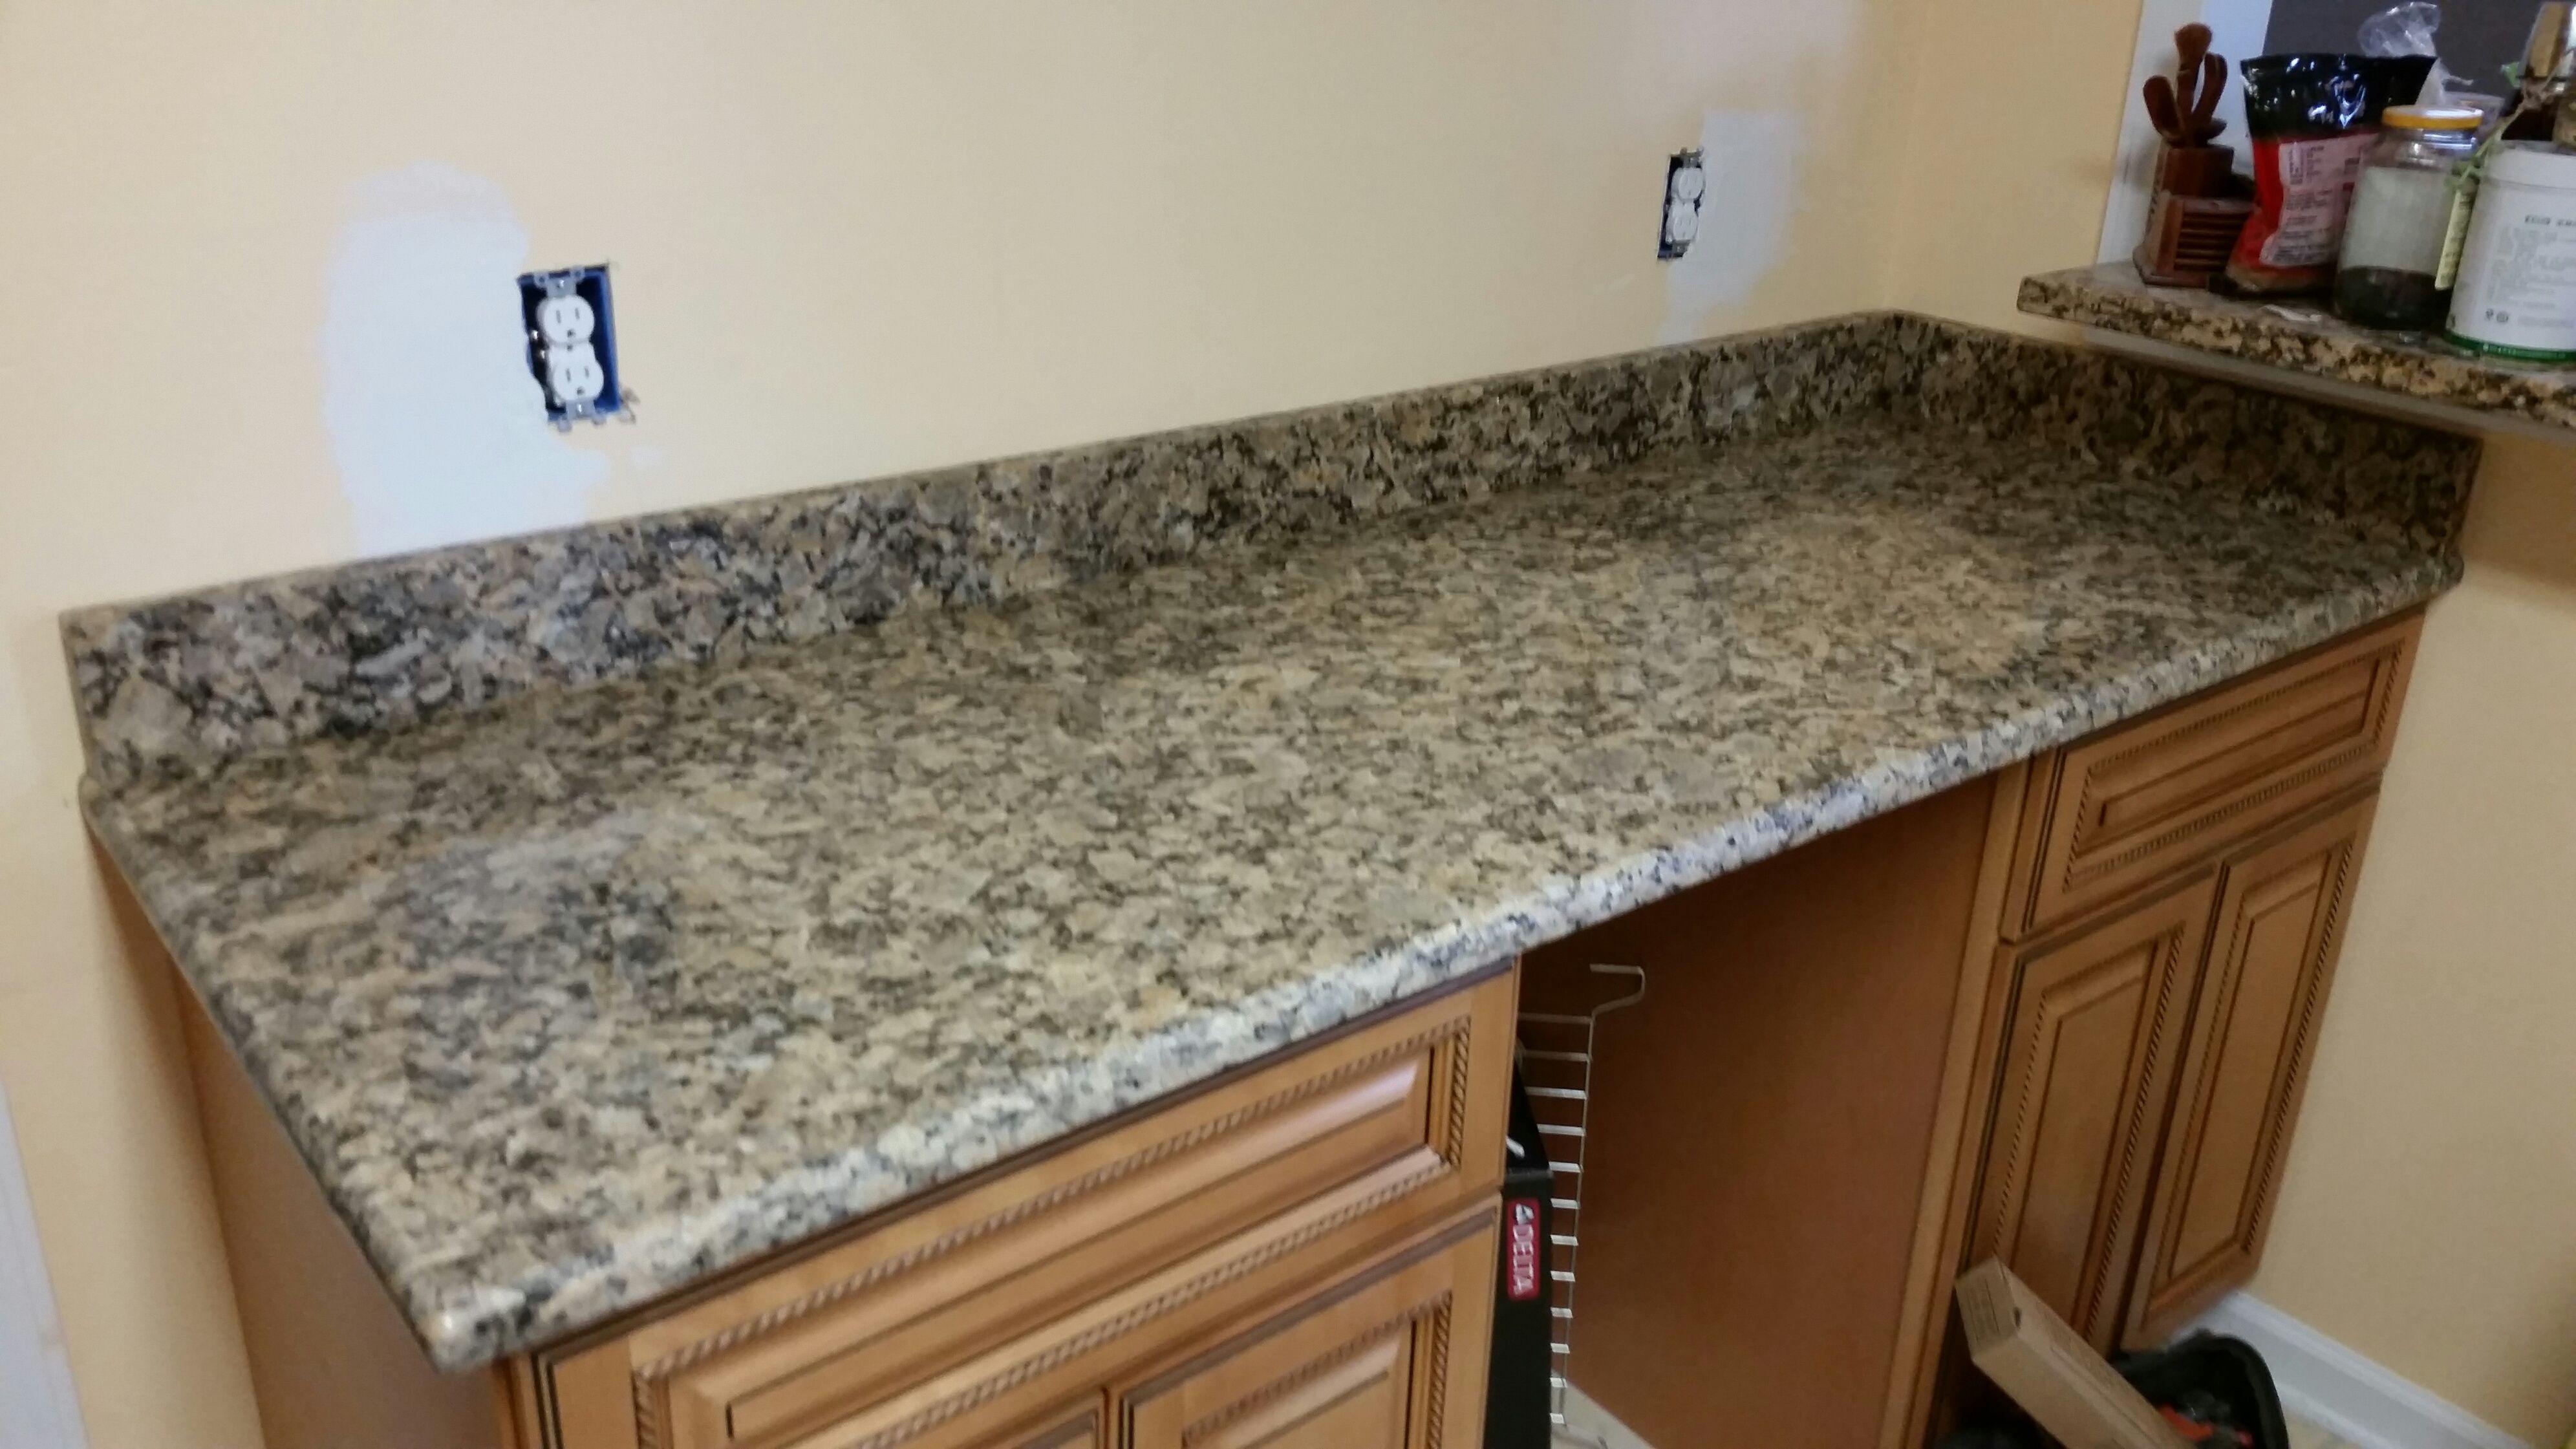 Giallo Fiorito Granite Kitchen Countertop Install For The Kirk Family.  Knoxvilleu0027s Stone Interiors. Showroom